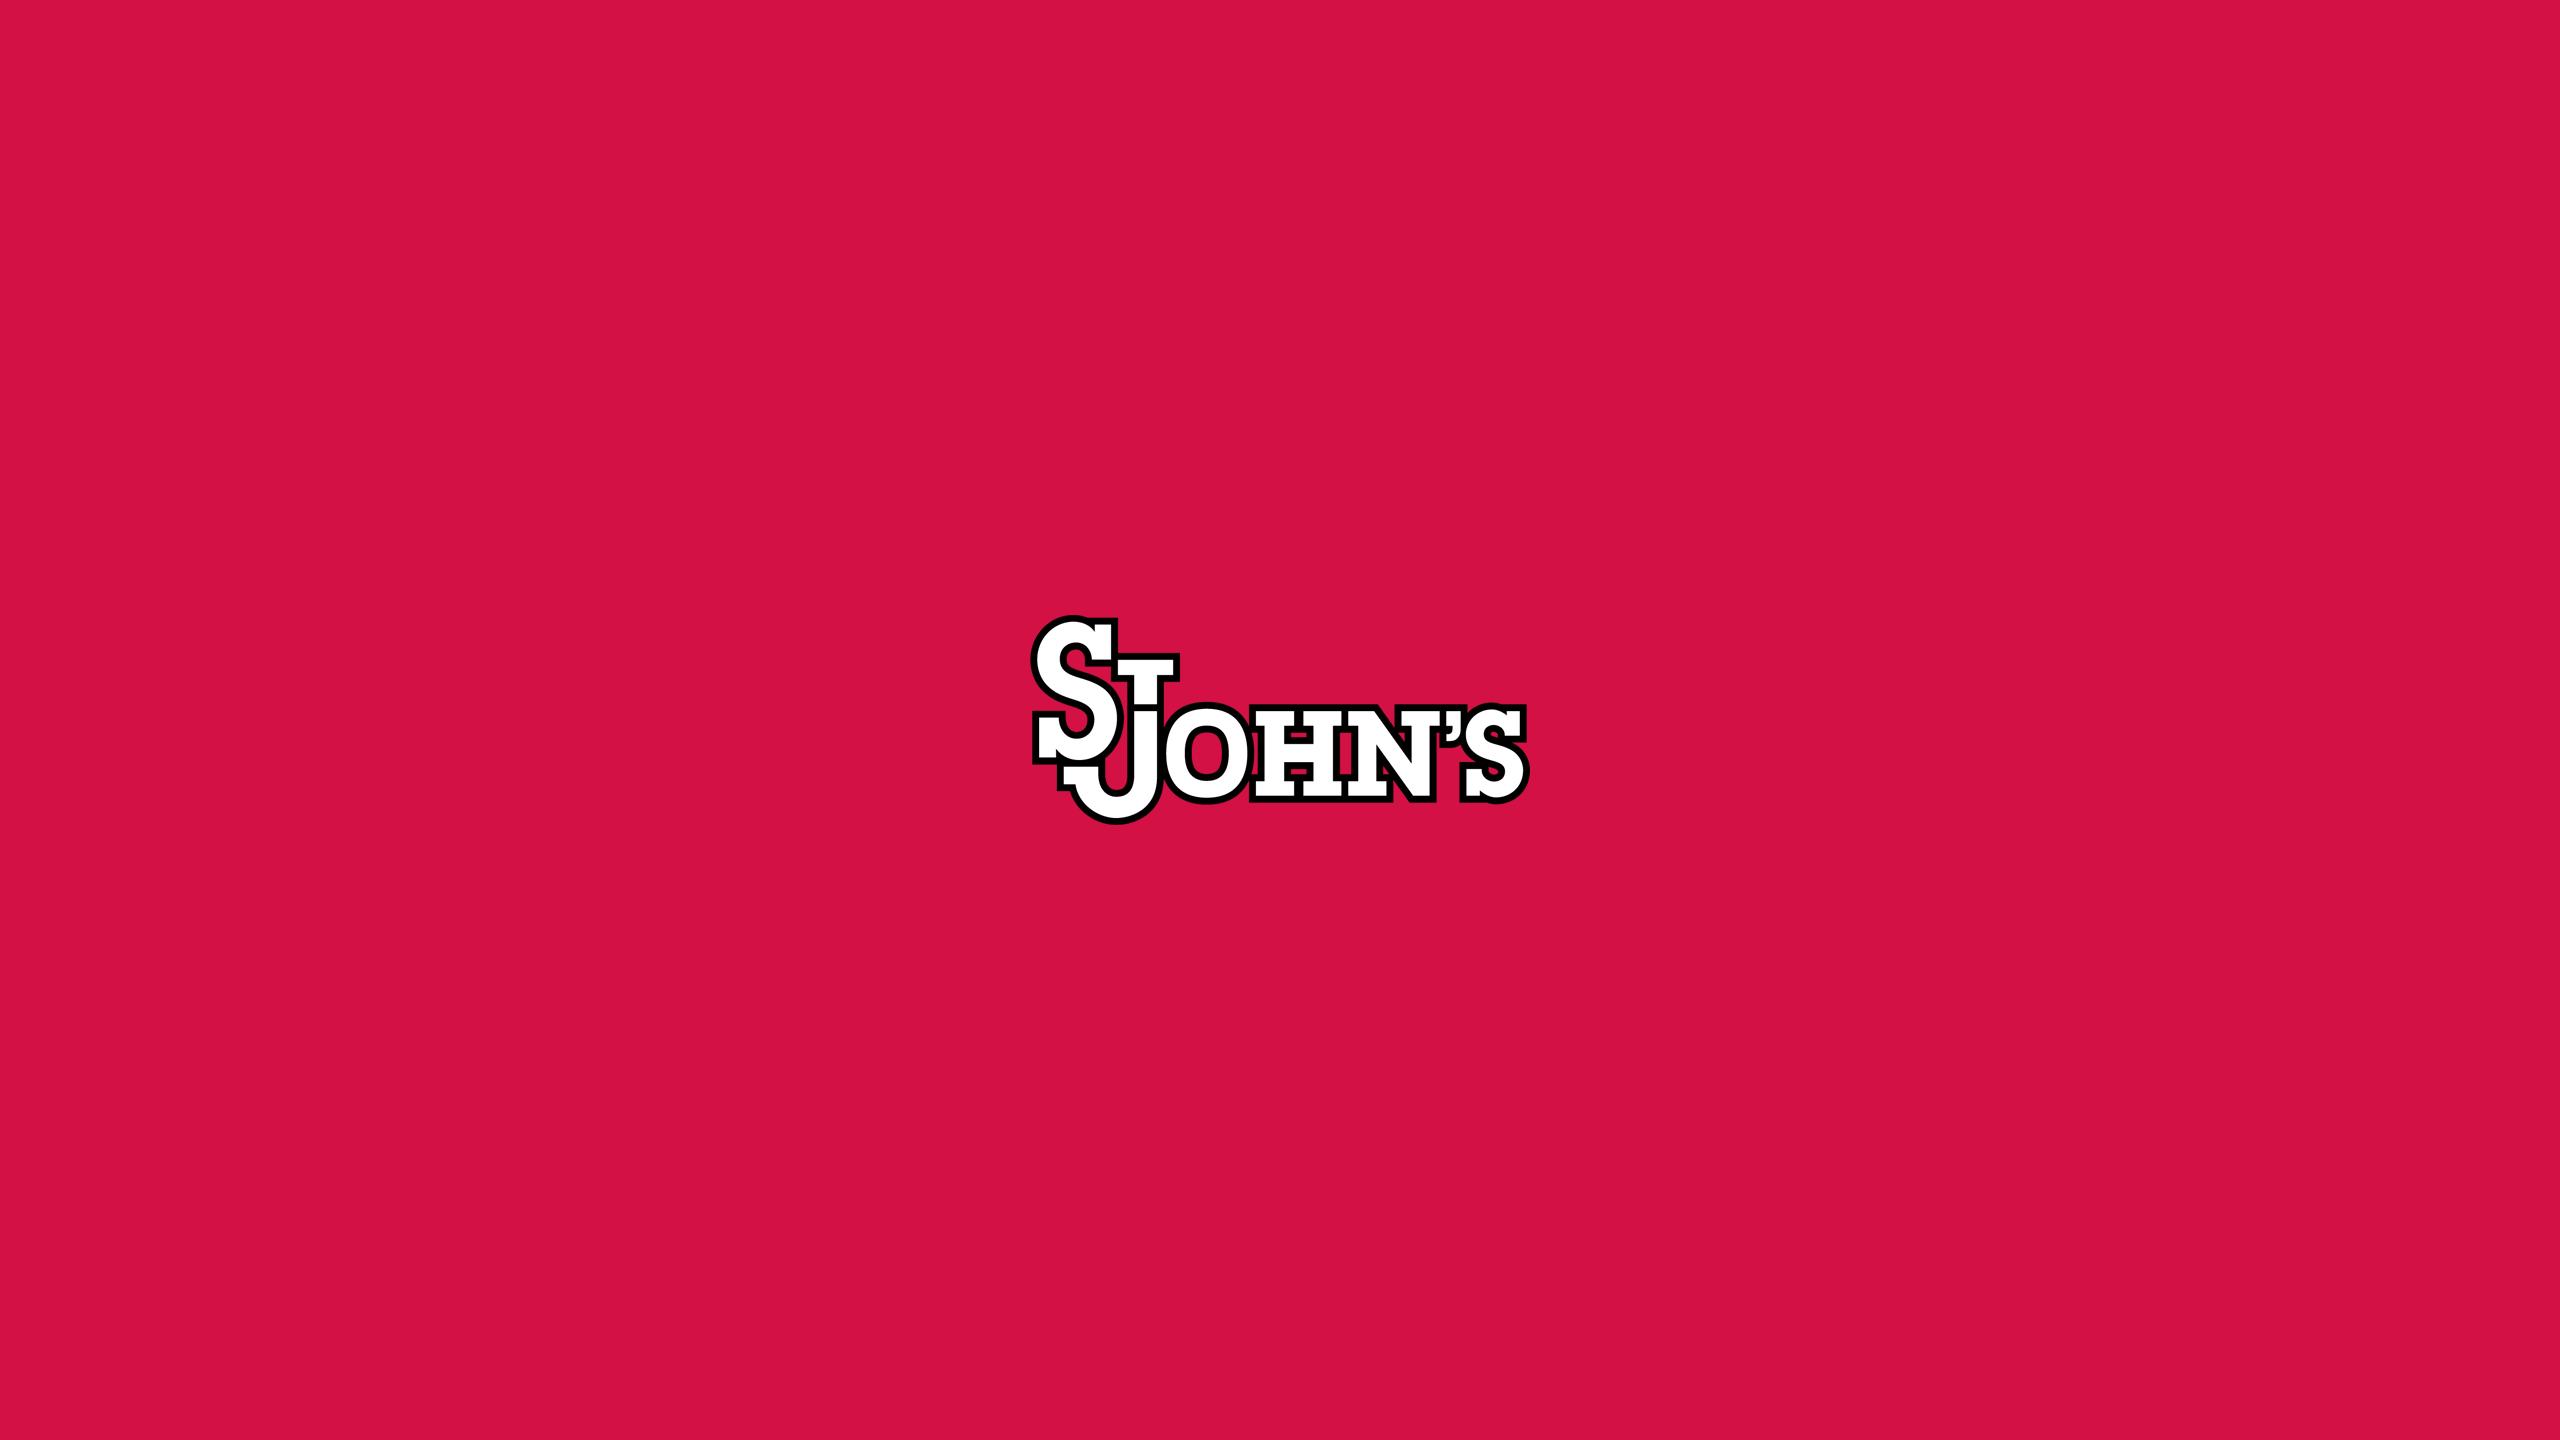 St. John's University Red Storm